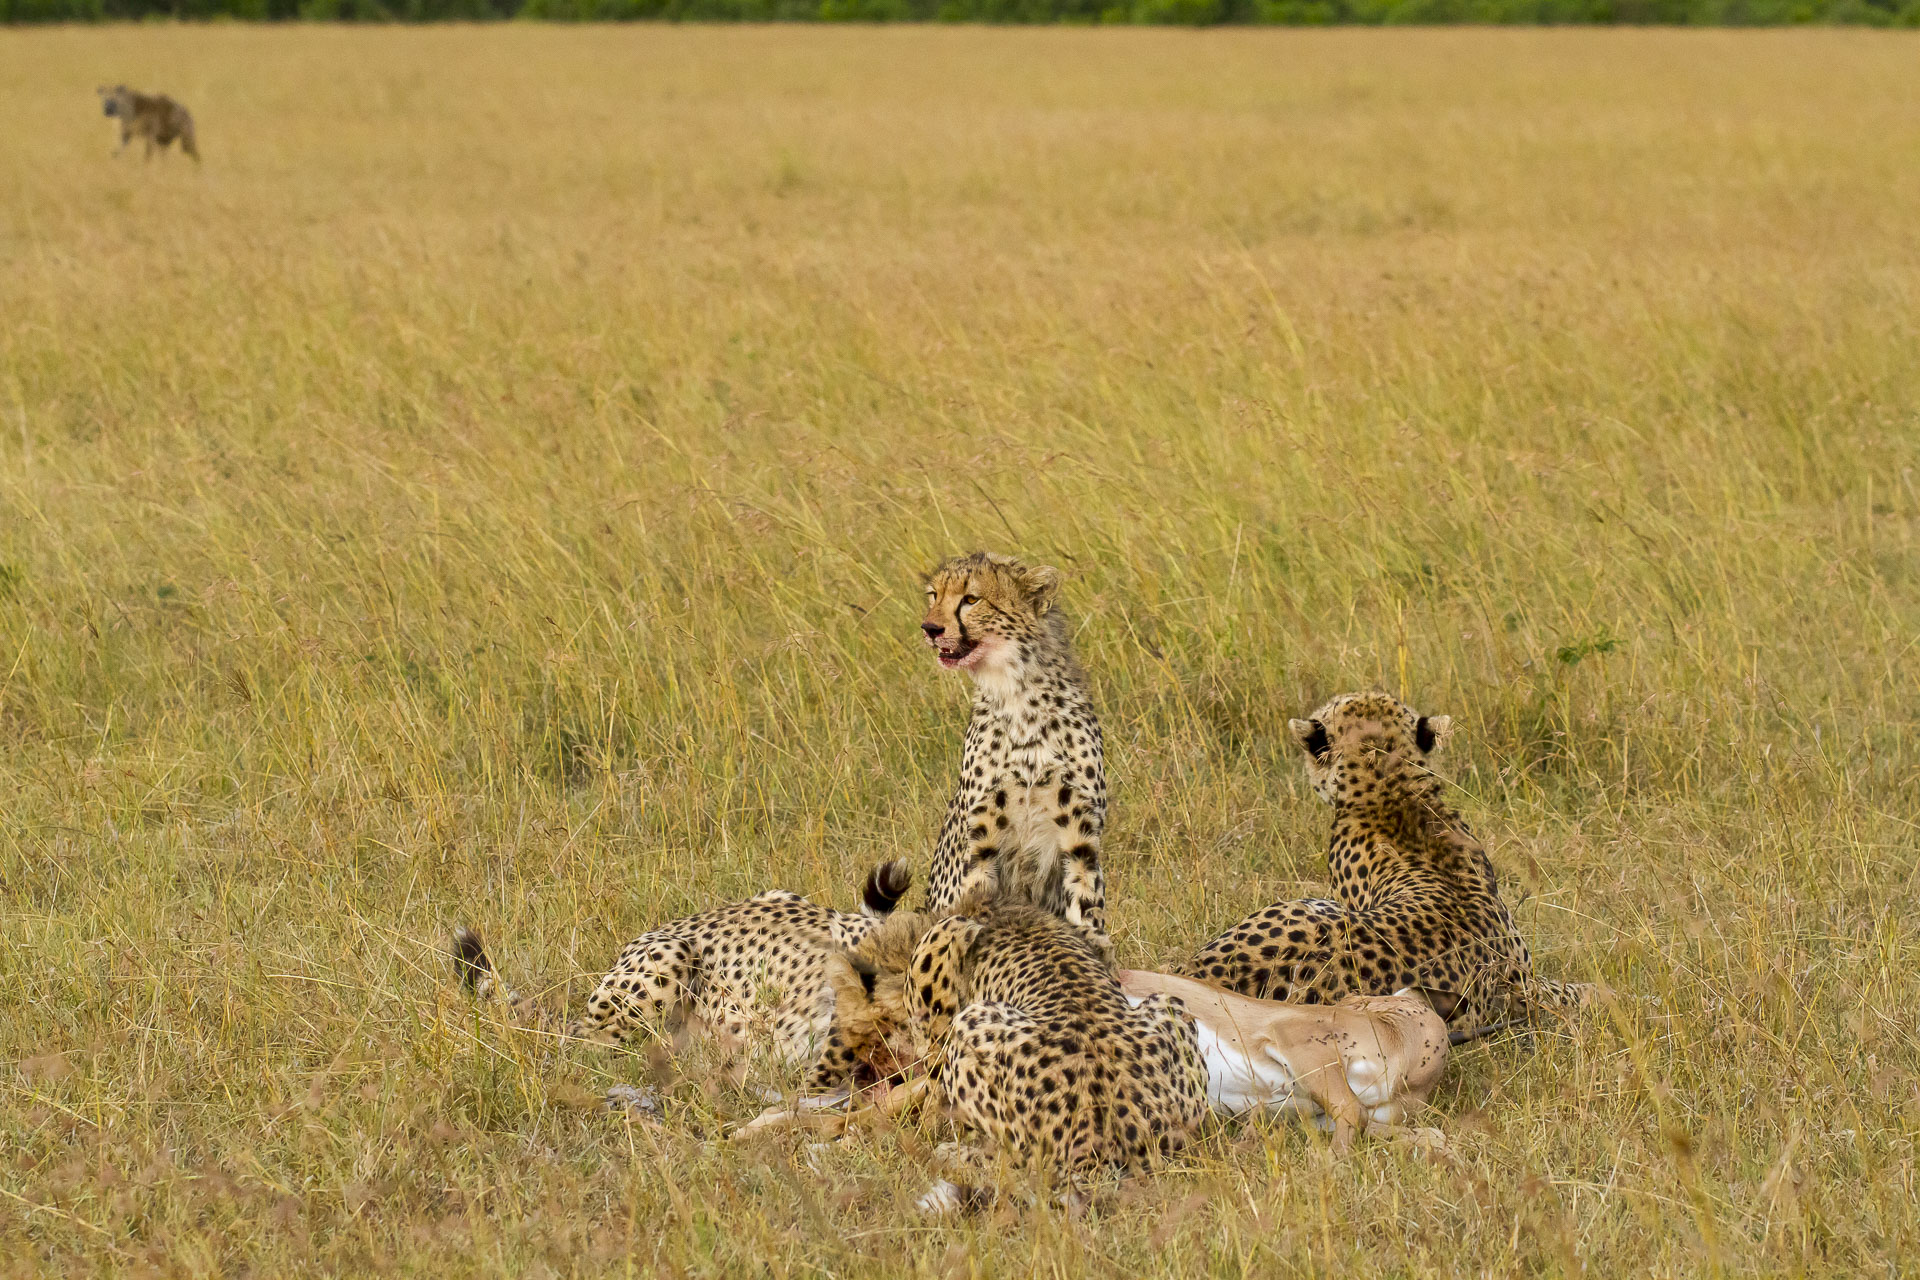 August 2006 — Mara Conservancy